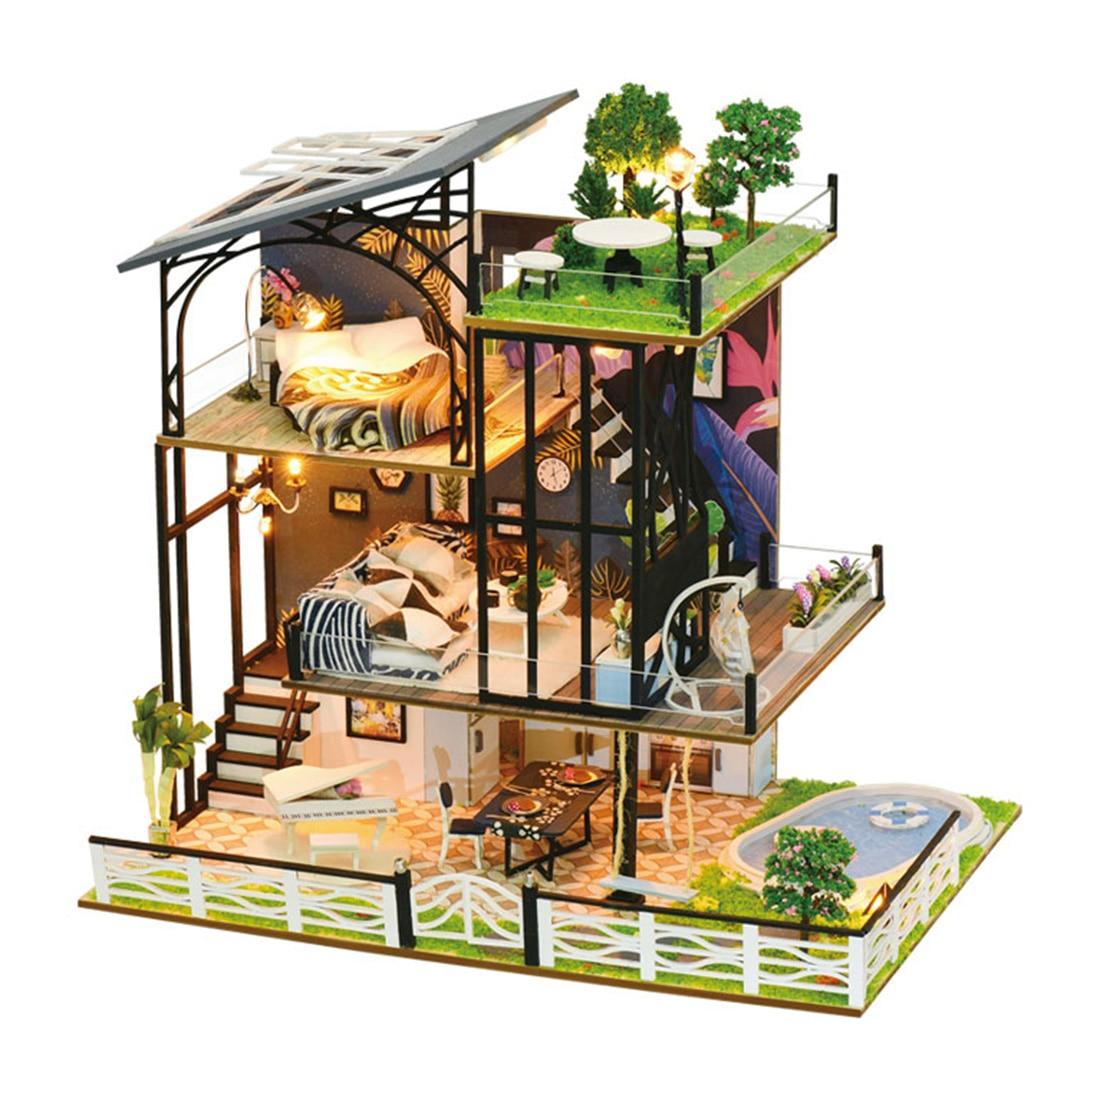 Three-Story Villa Kits DIY Wooden Miniature Dollhouse Handmade Doll House Model Gift For New Year Birthday